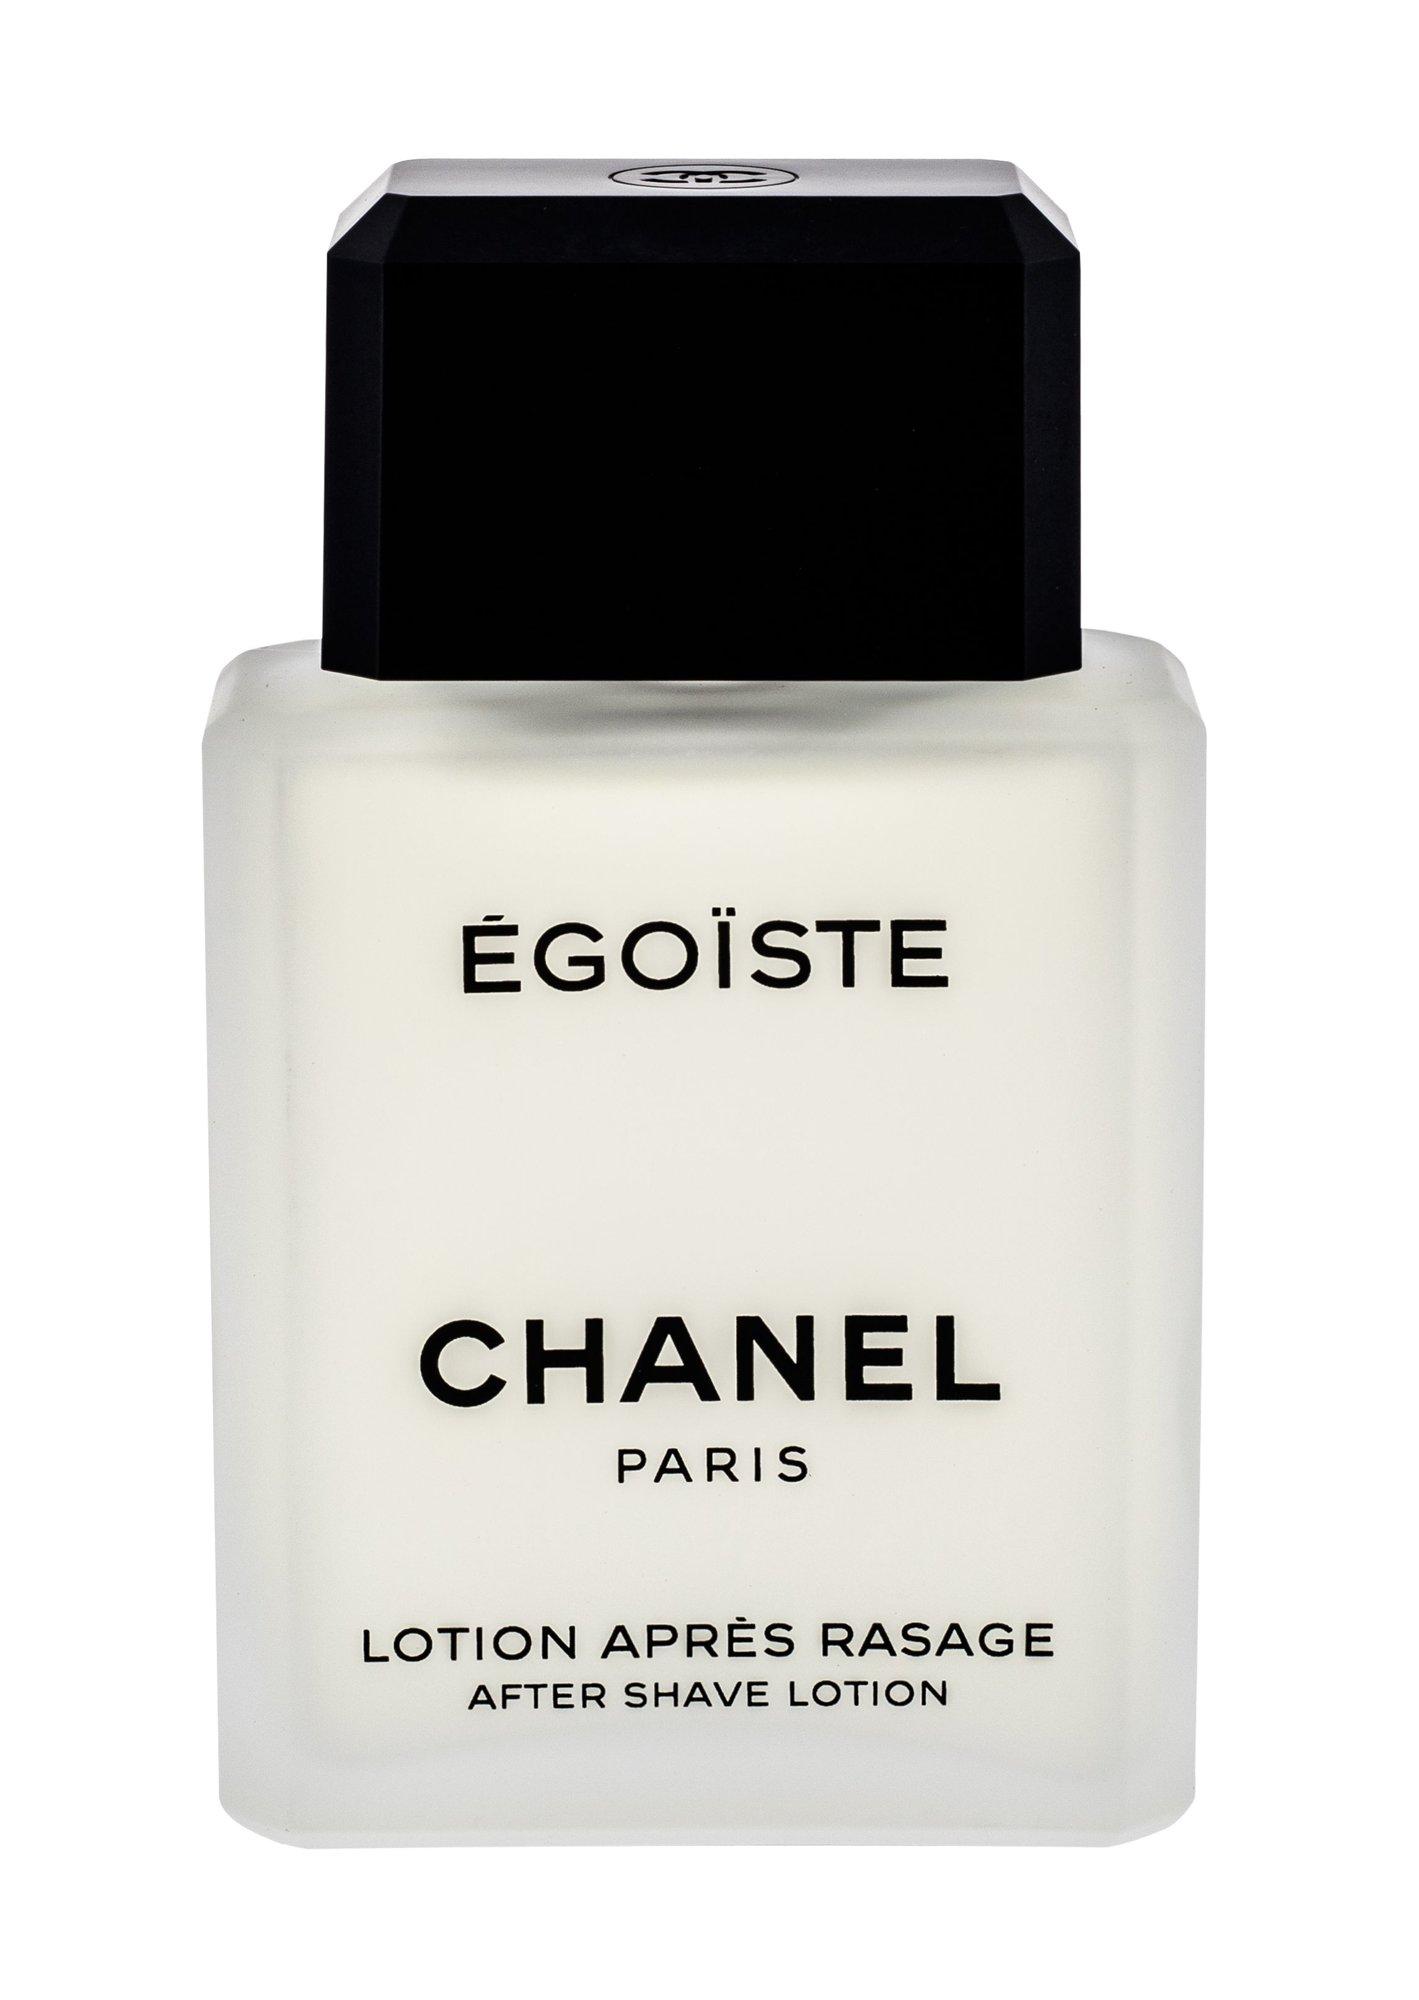 Chanel Egoiste Pour Homme Aftershave 100ml